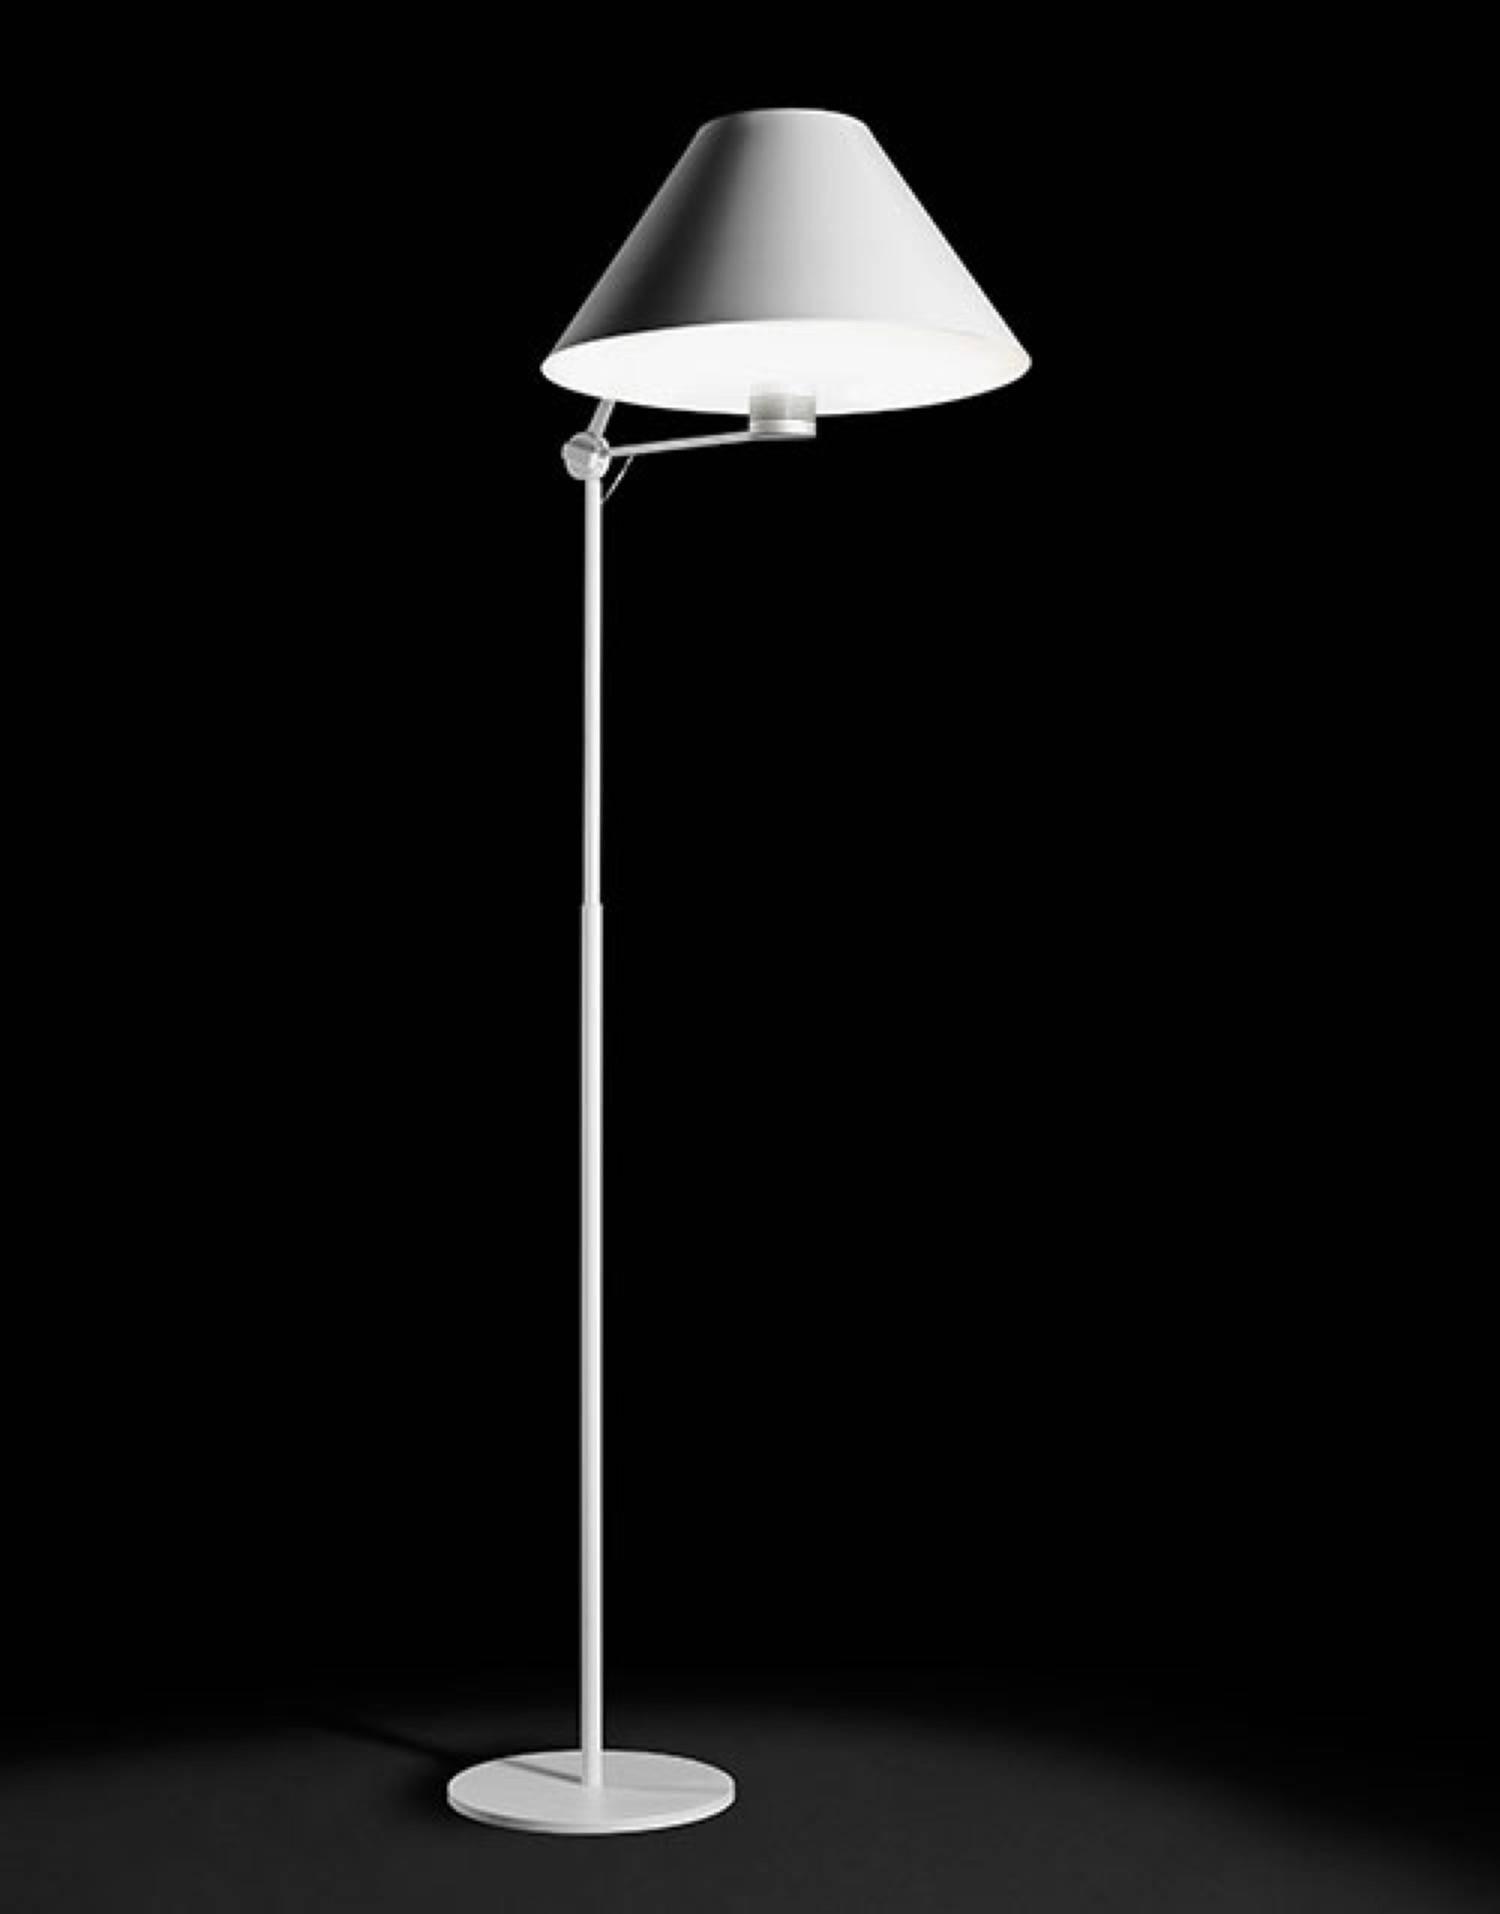 antonangeli cinema l mpara de lampadaire cinf02bibi l mparas de dise o. Black Bedroom Furniture Sets. Home Design Ideas